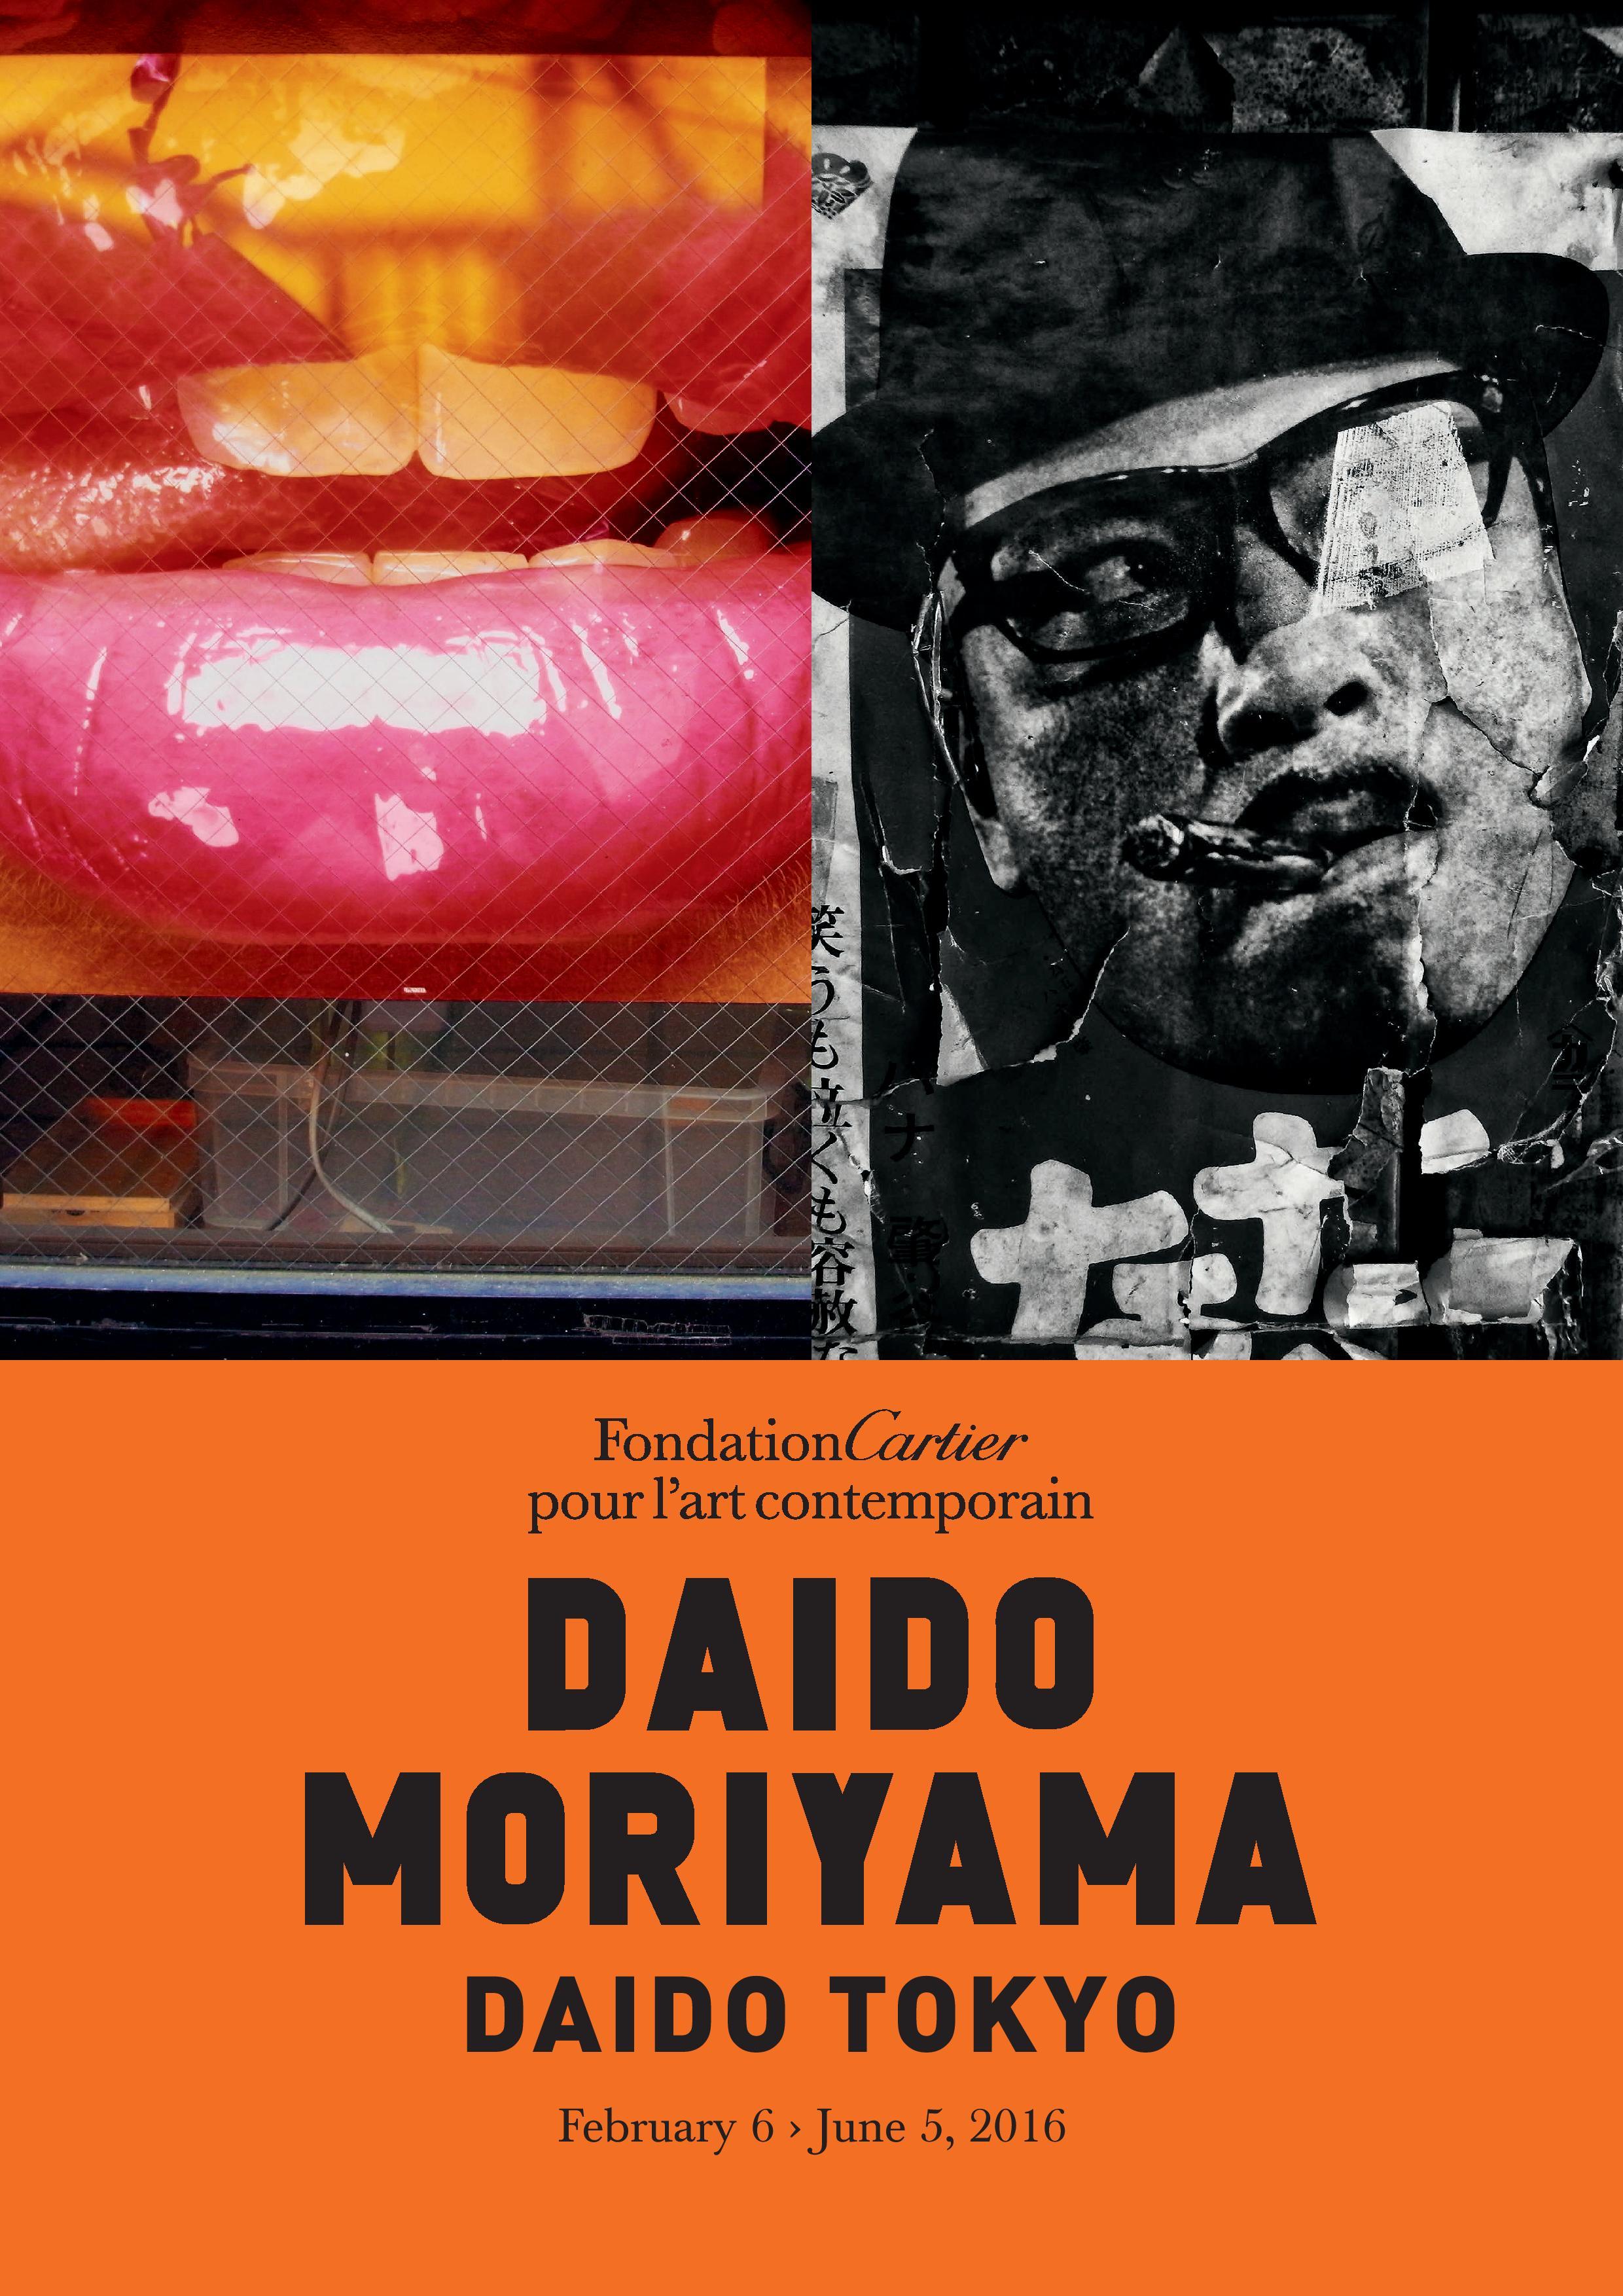 Daido Moriyama Foundation Cartier Poster